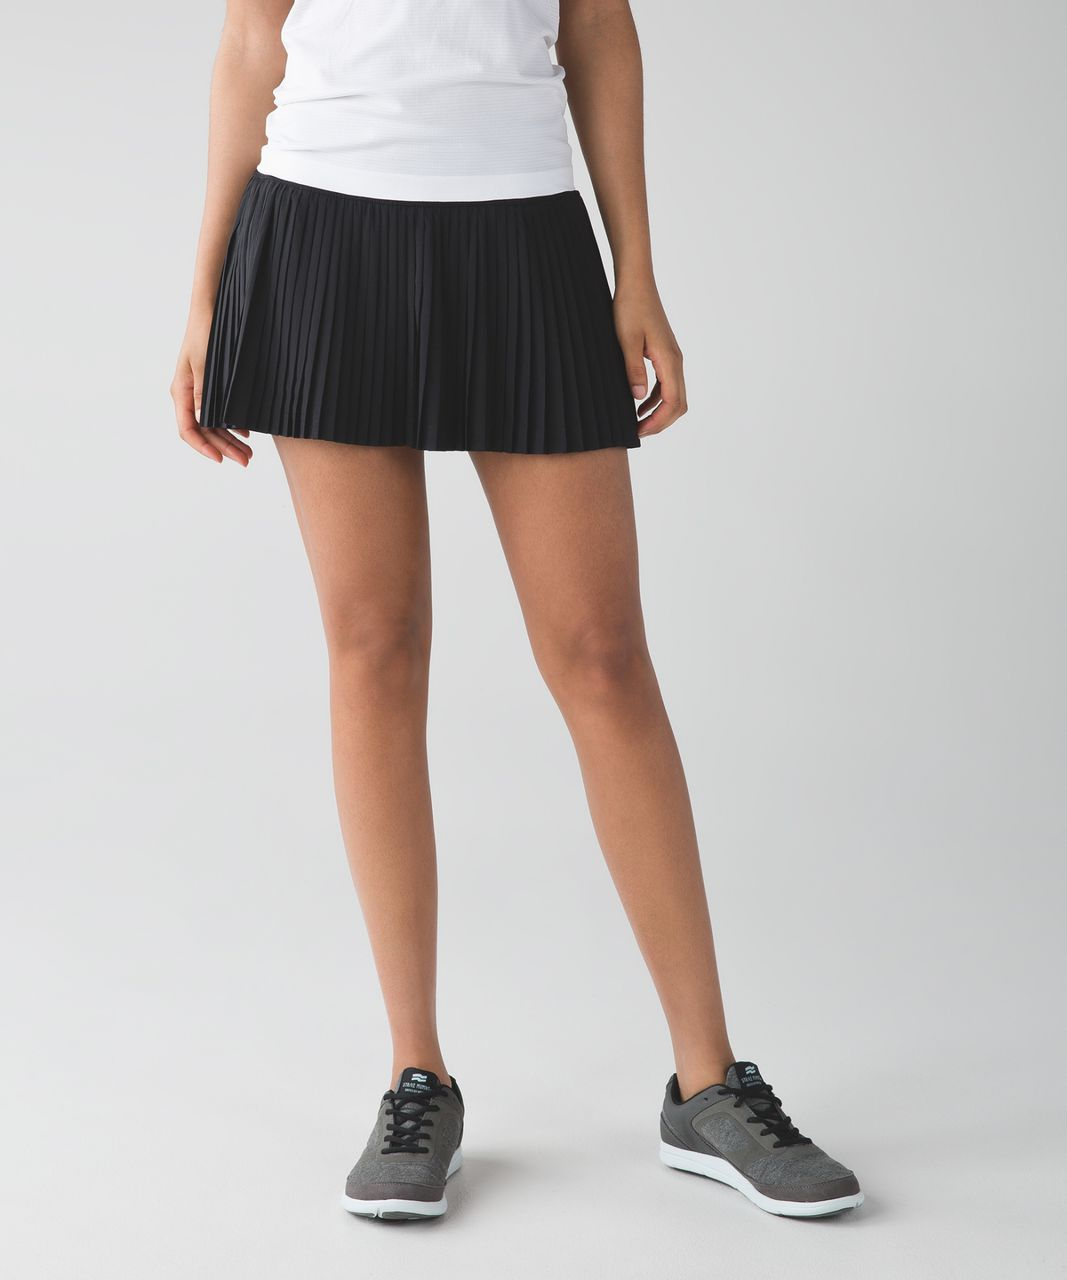 17d8b9cf3f Lululemon Pleat To Street Skirt II - Black - lulu fanatics